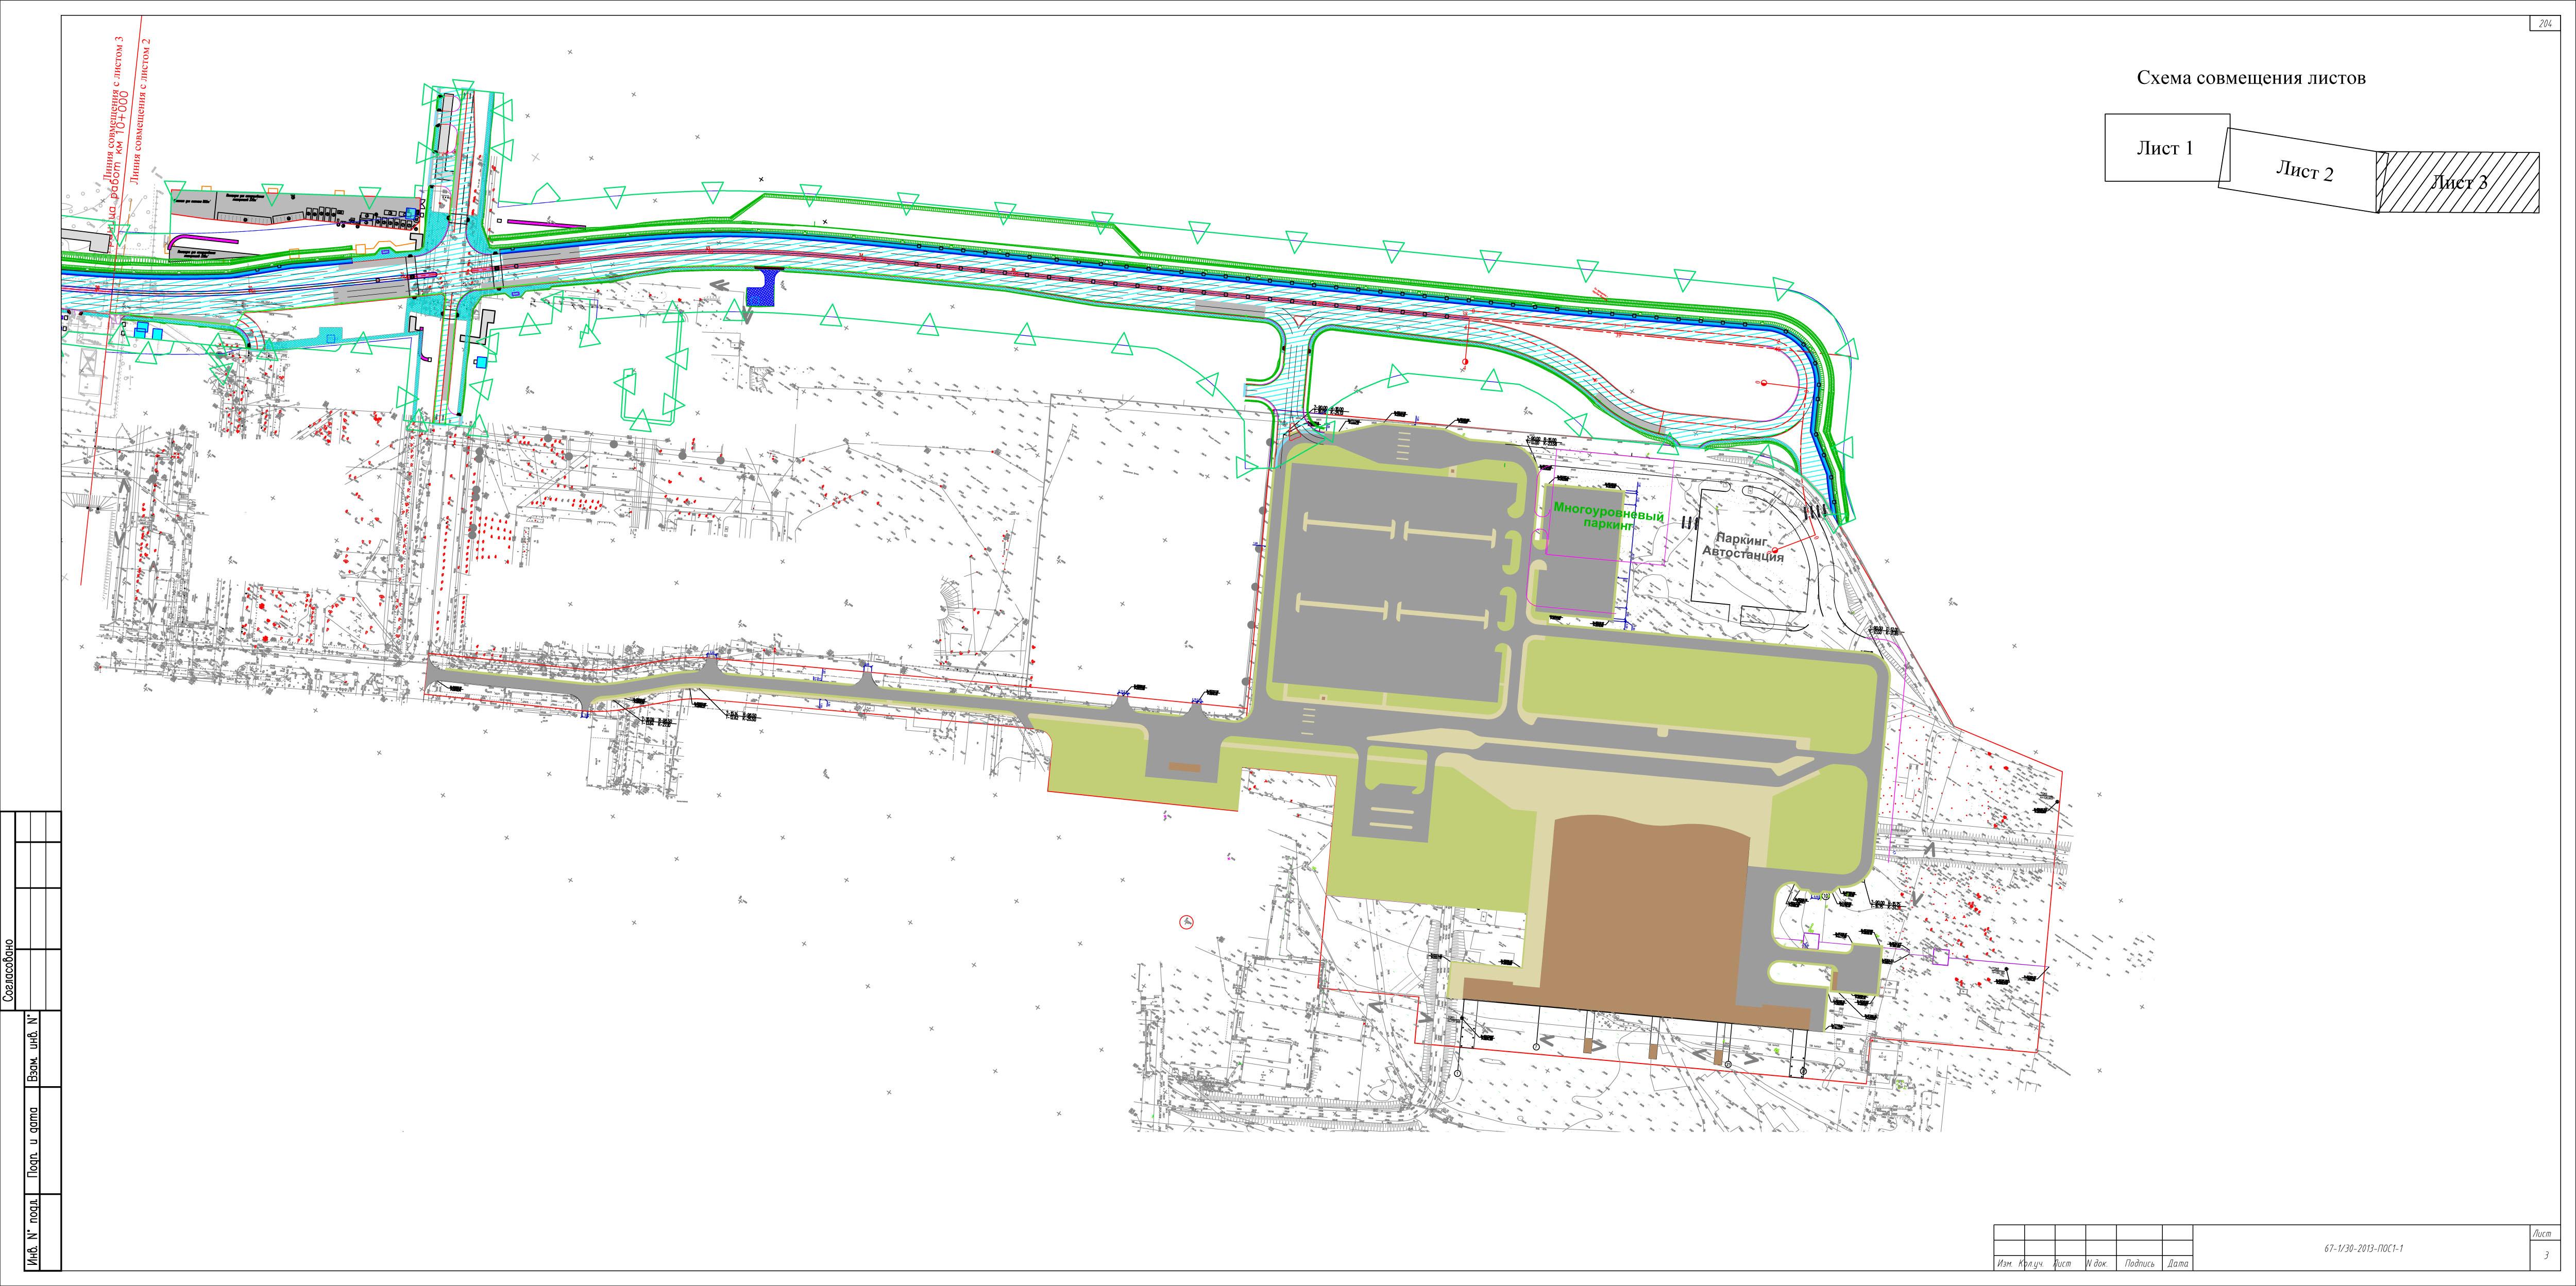 Схема аэропорта курумоч